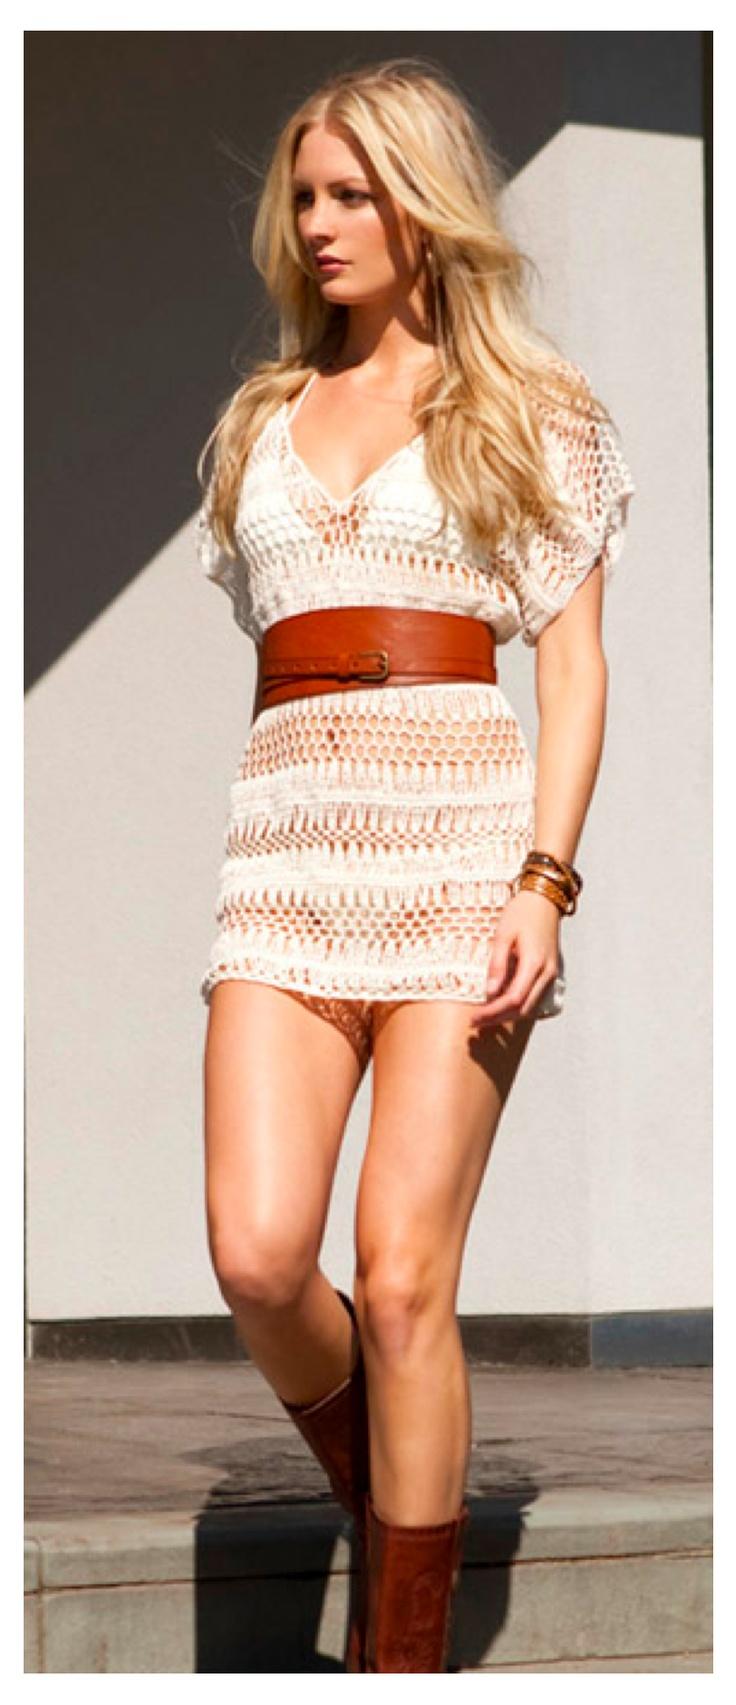 Anna Kosturova - Bardot Dress- #spaweeksummer